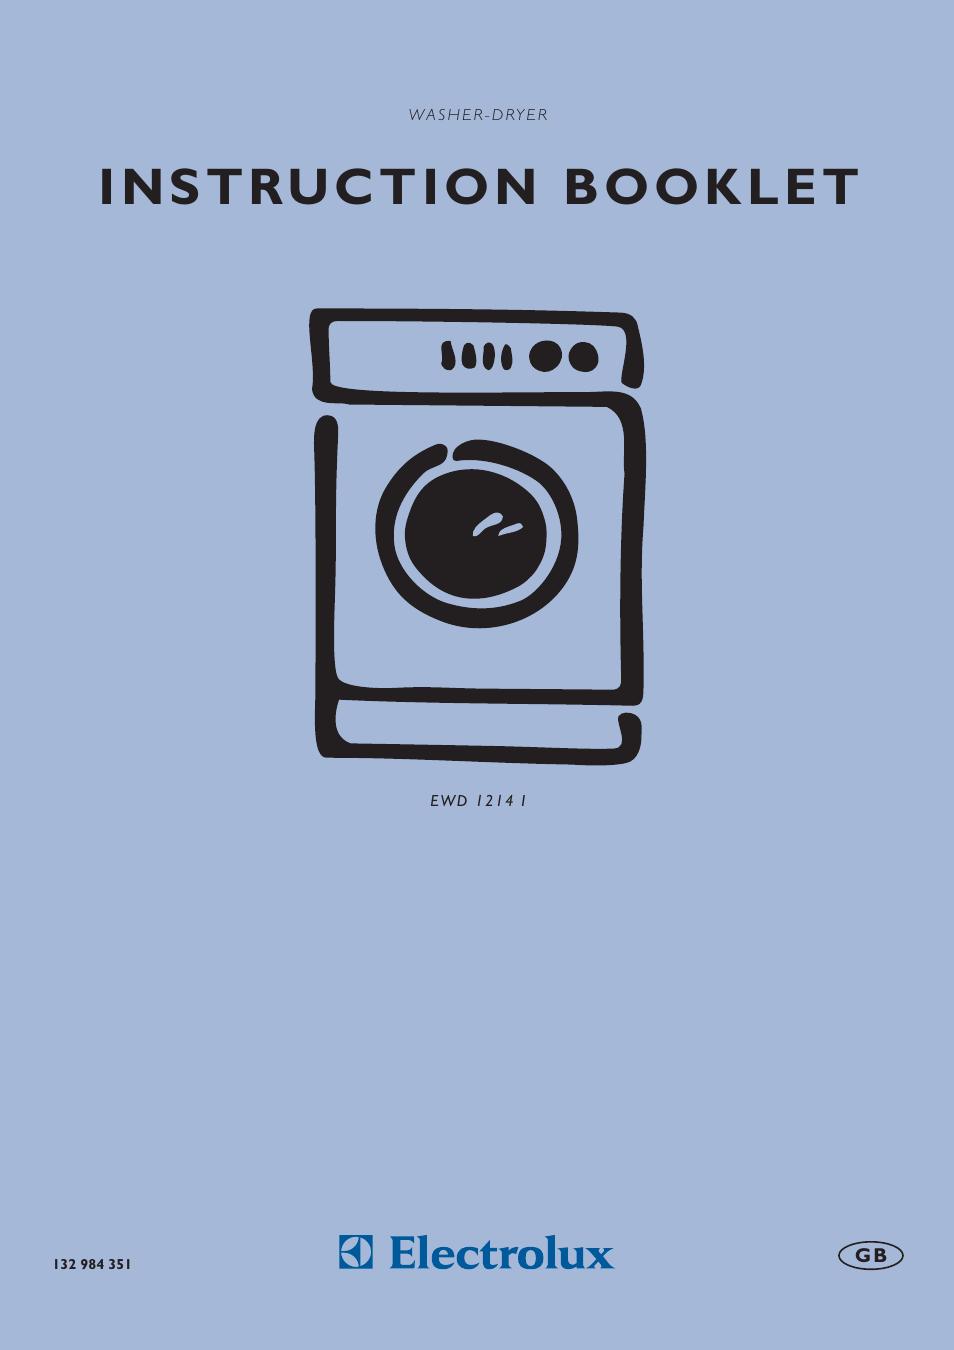 electrolux aqualux ewd 1214 i user manual 30 pages rh manualsdir com Instruction Manual electrolux washer dryer combo eww1273 user manual